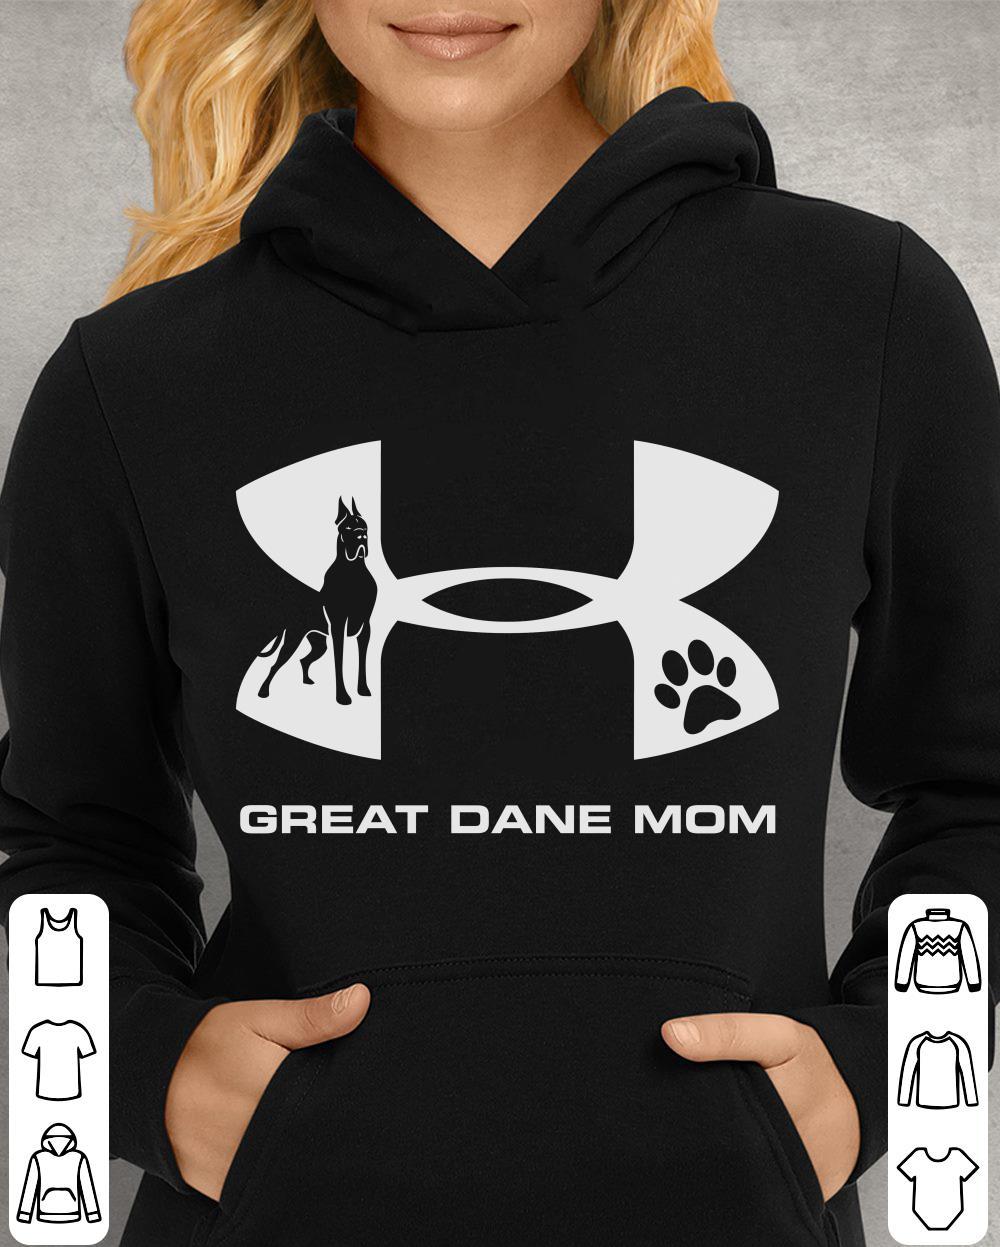 https://unicornshirts.net/images/2018/11/Under-Armour-Great-Dane-Mom-shirt_4.jpg